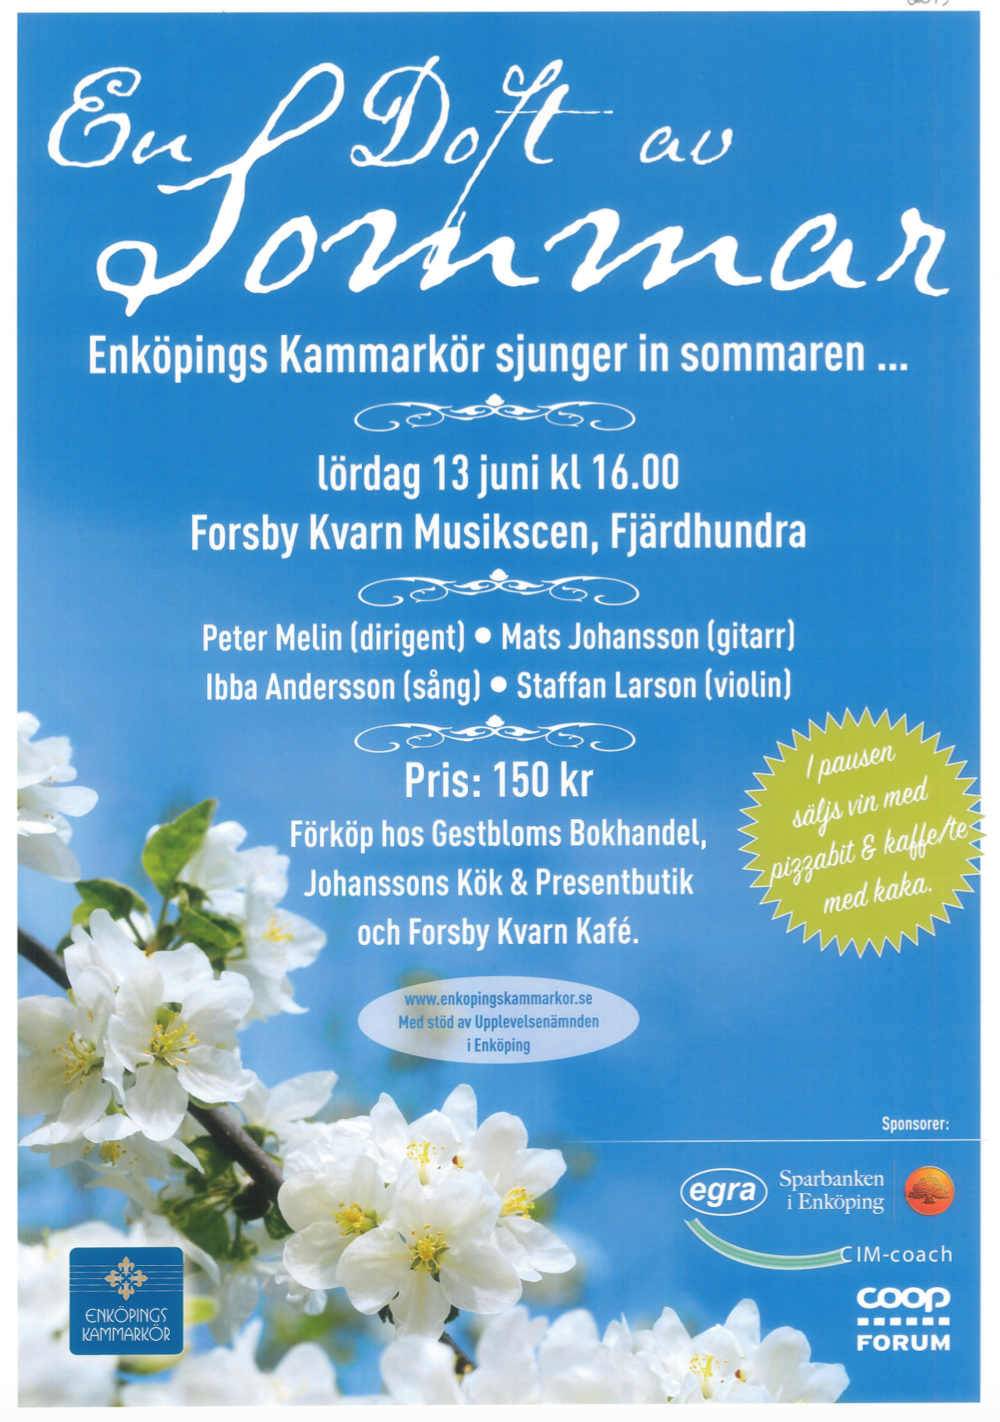 2015-affisch-en-doft-av-sommar-med-enkopings-kammarkor